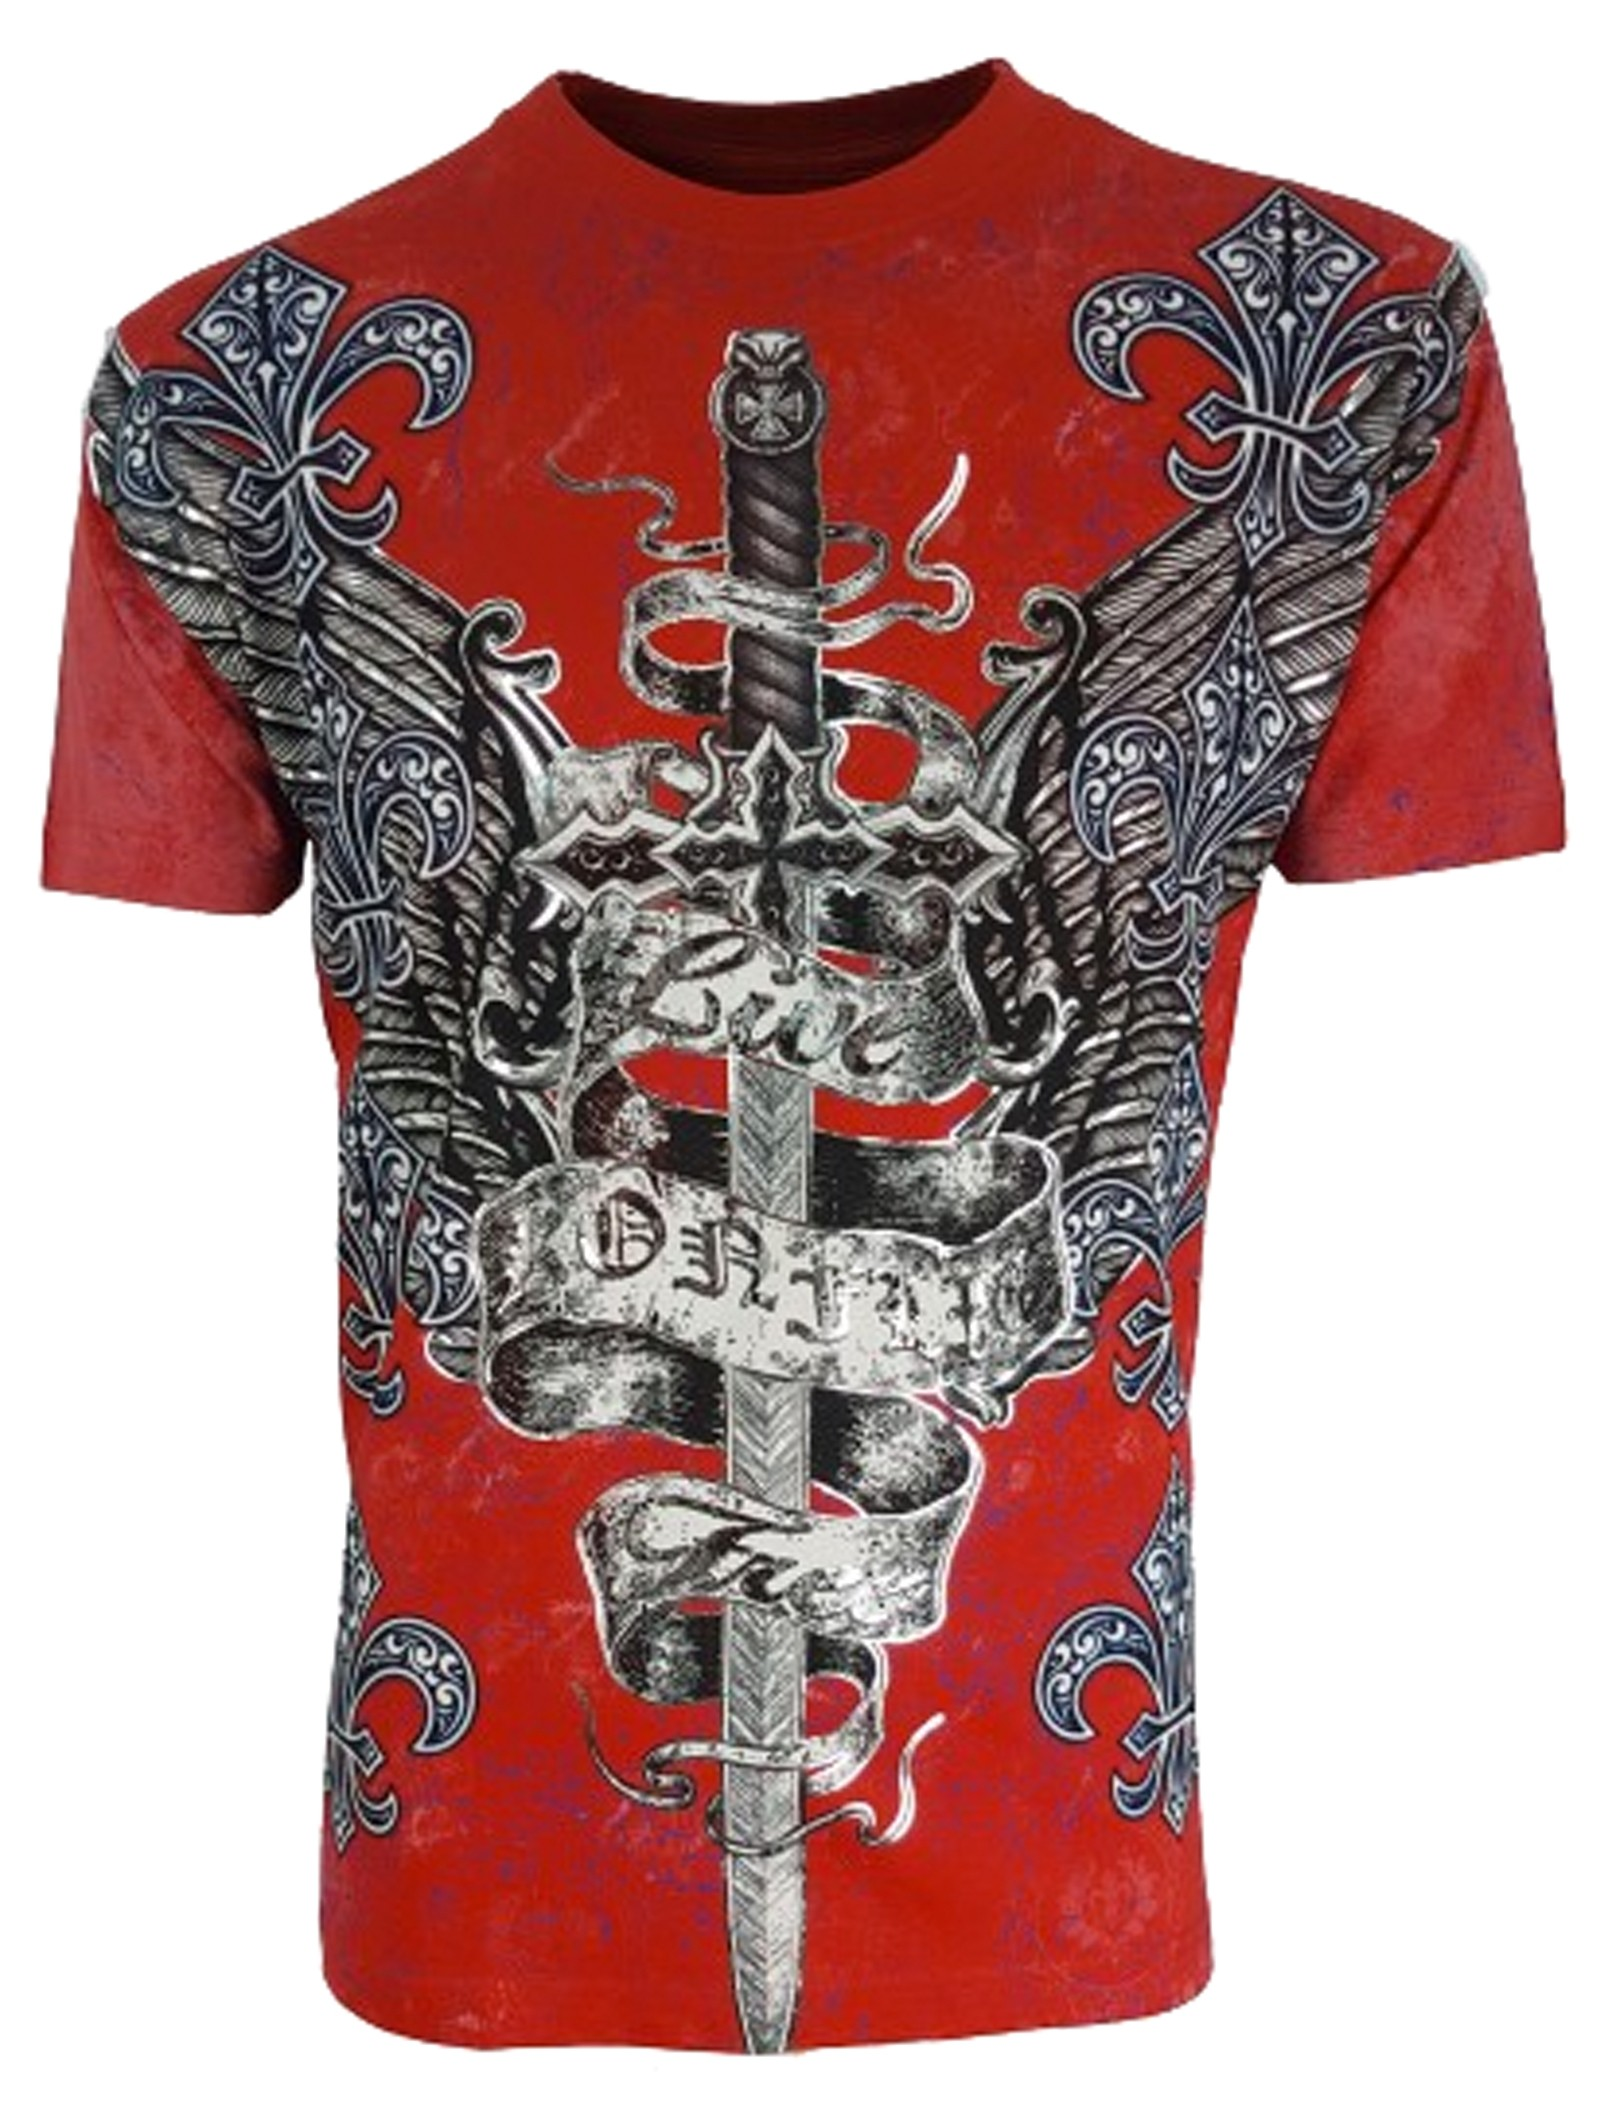 Konflic Clothing - Templars T-Shirt